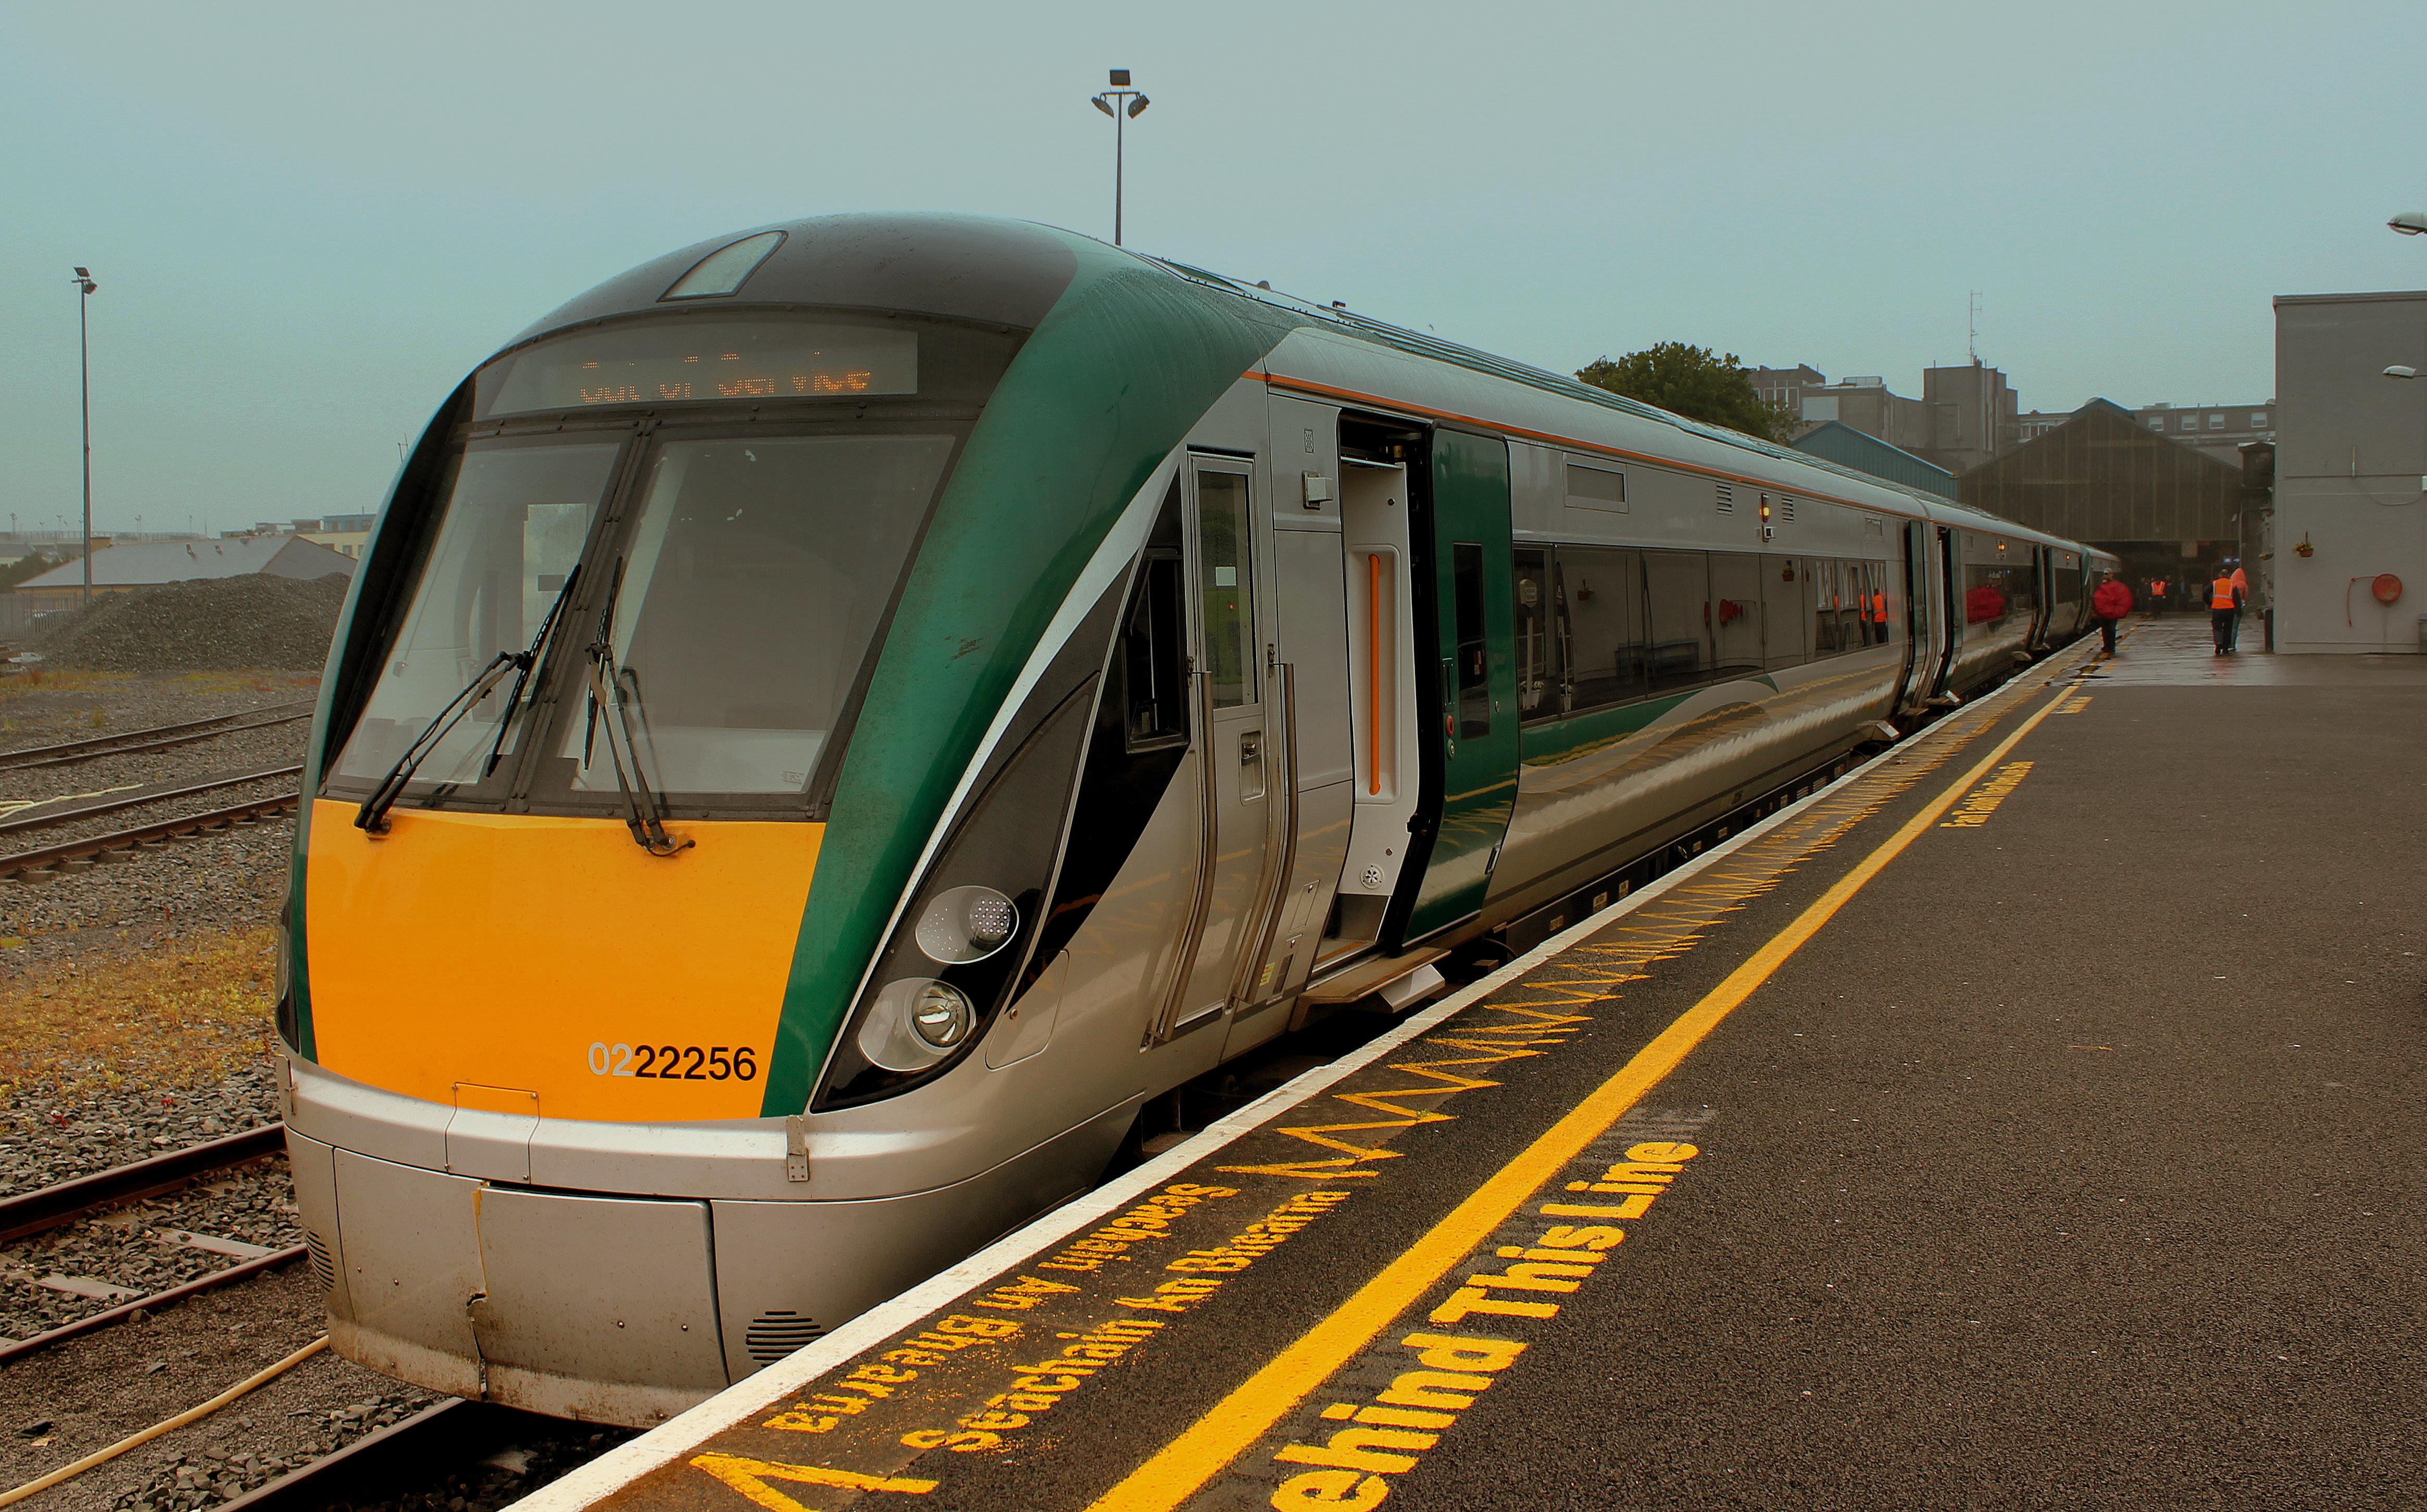 Major disruptions on Heuston line due to tragic death